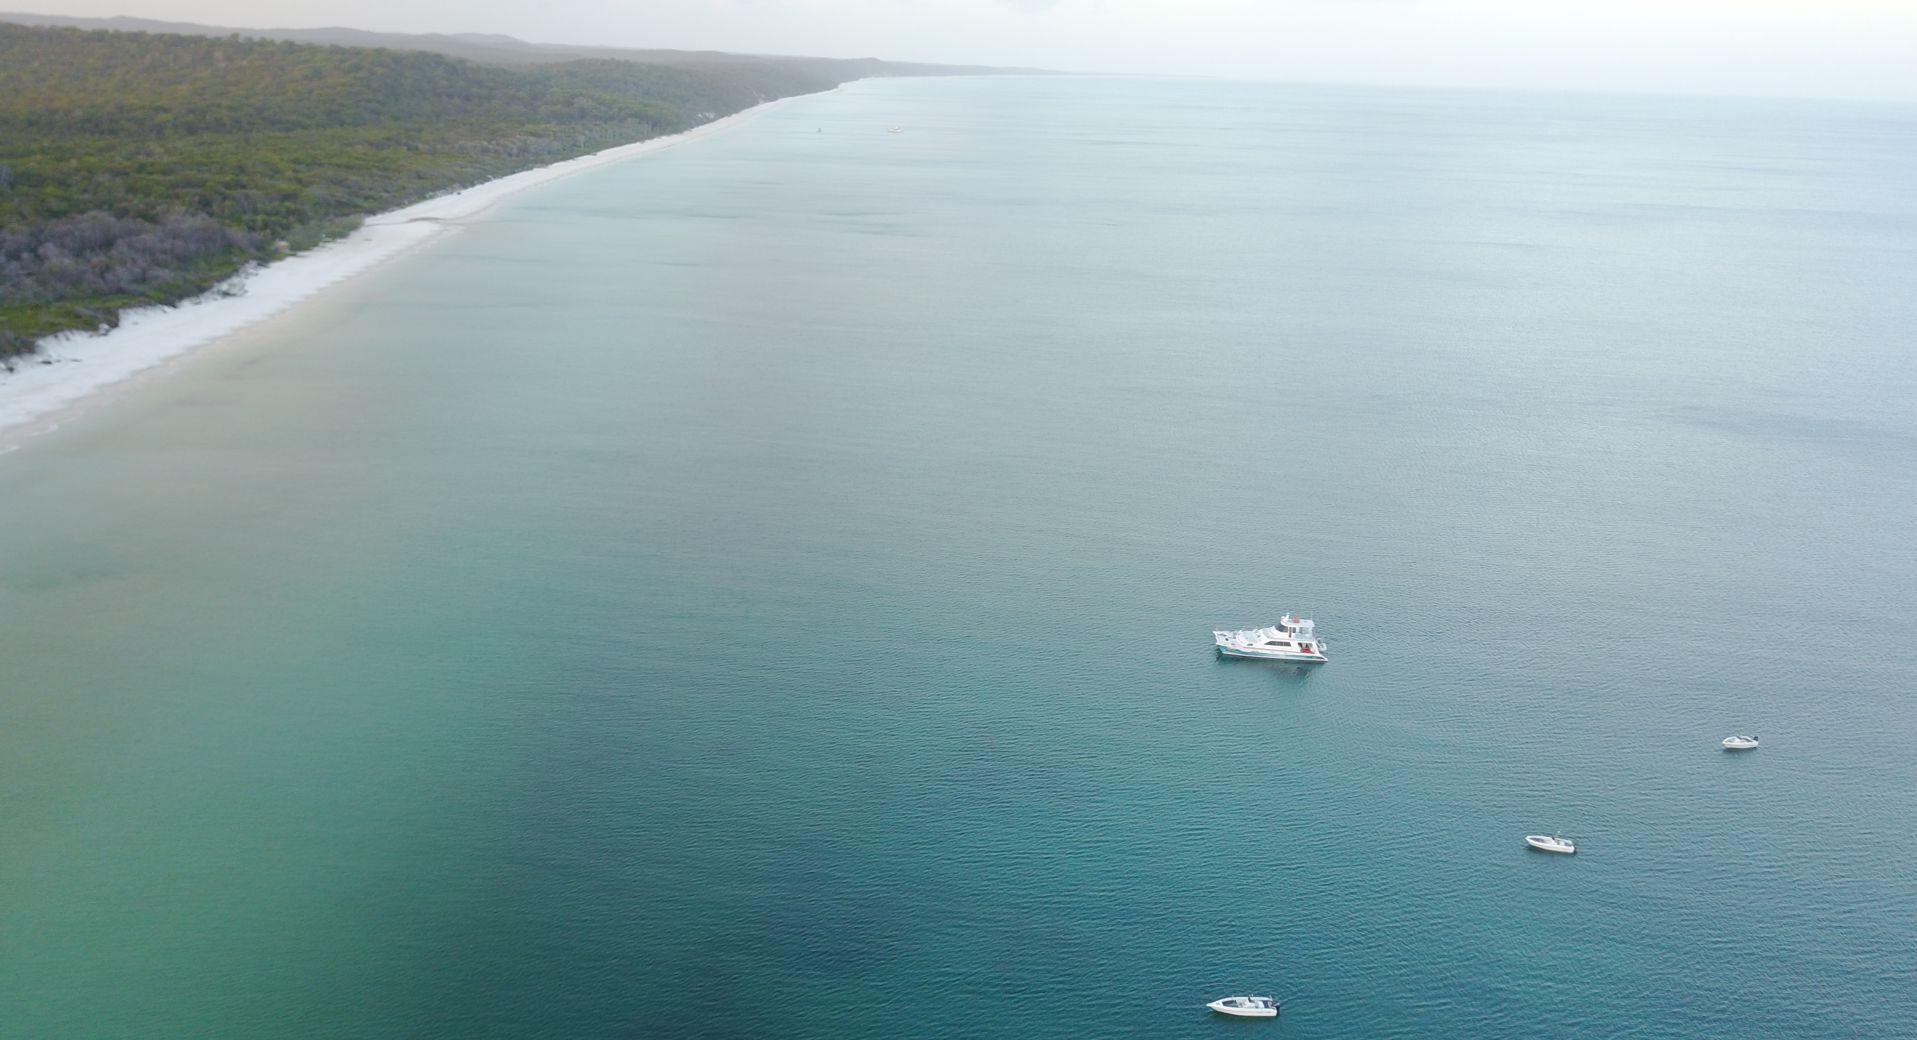 Waking up along Fraser Islands west coast onboard Freedom III